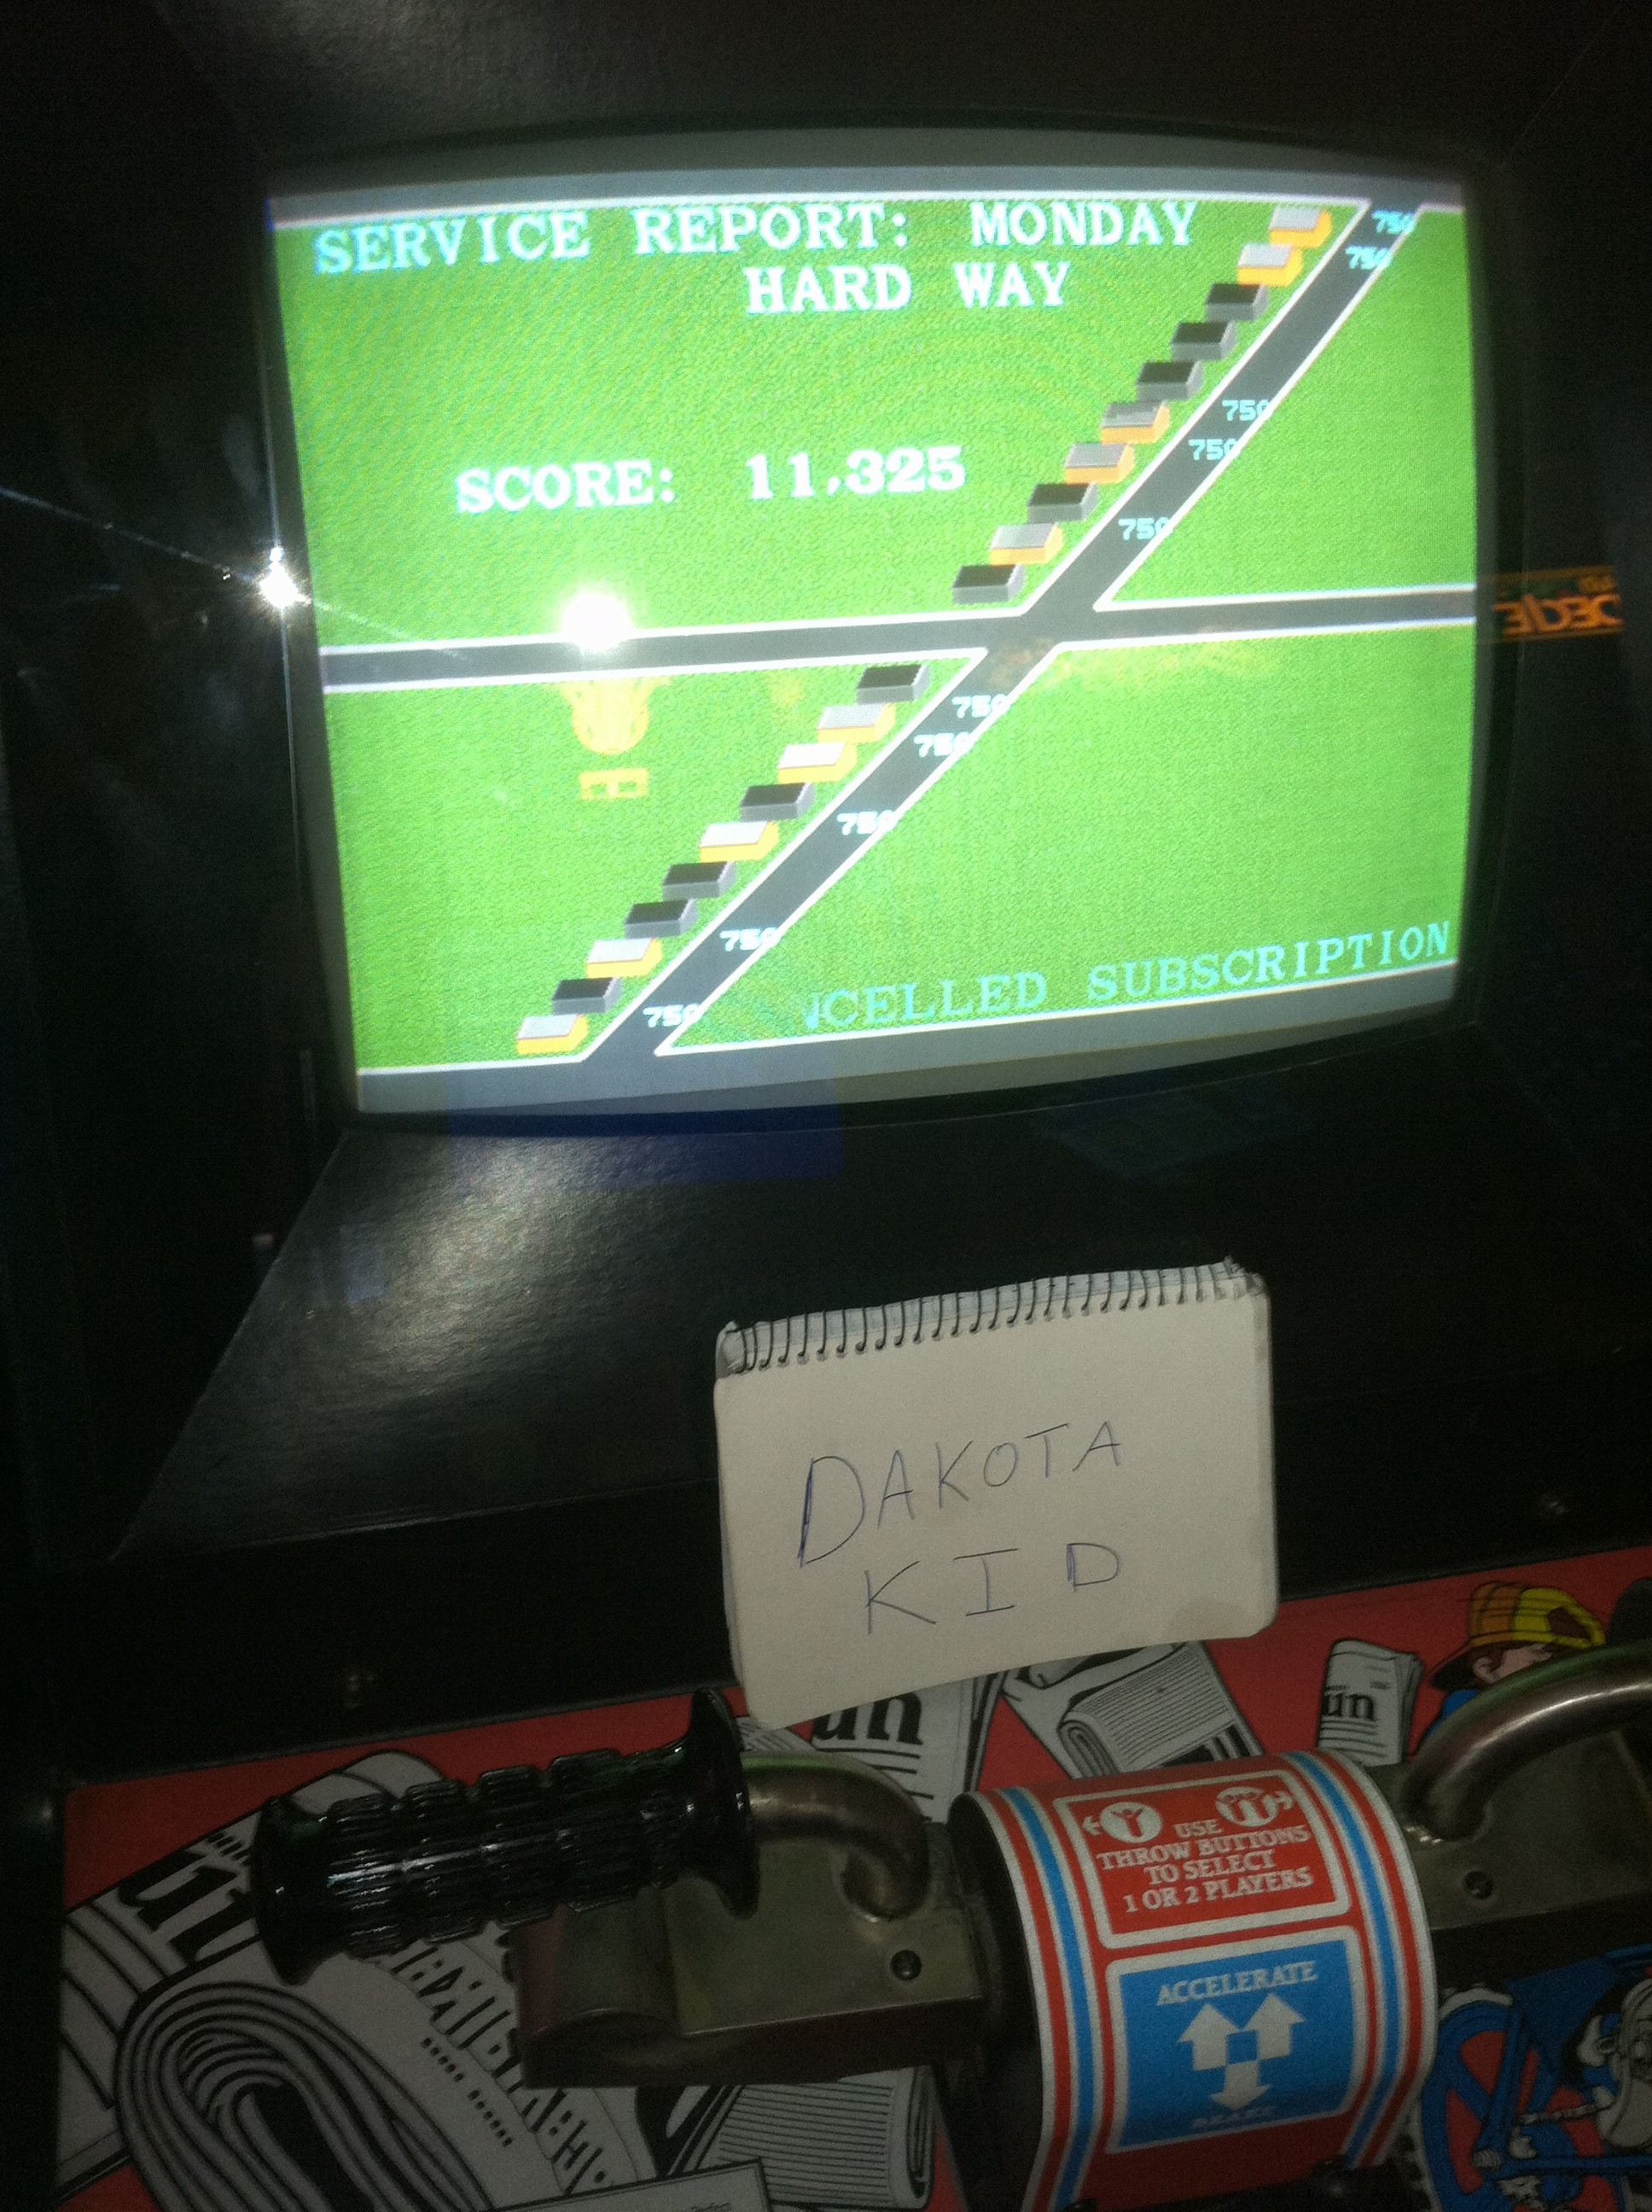 DakotaKid: Paperboy [Hard Way: 3 Lives] (Arcade) 11,325 points on 2018-10-12 15:19:27